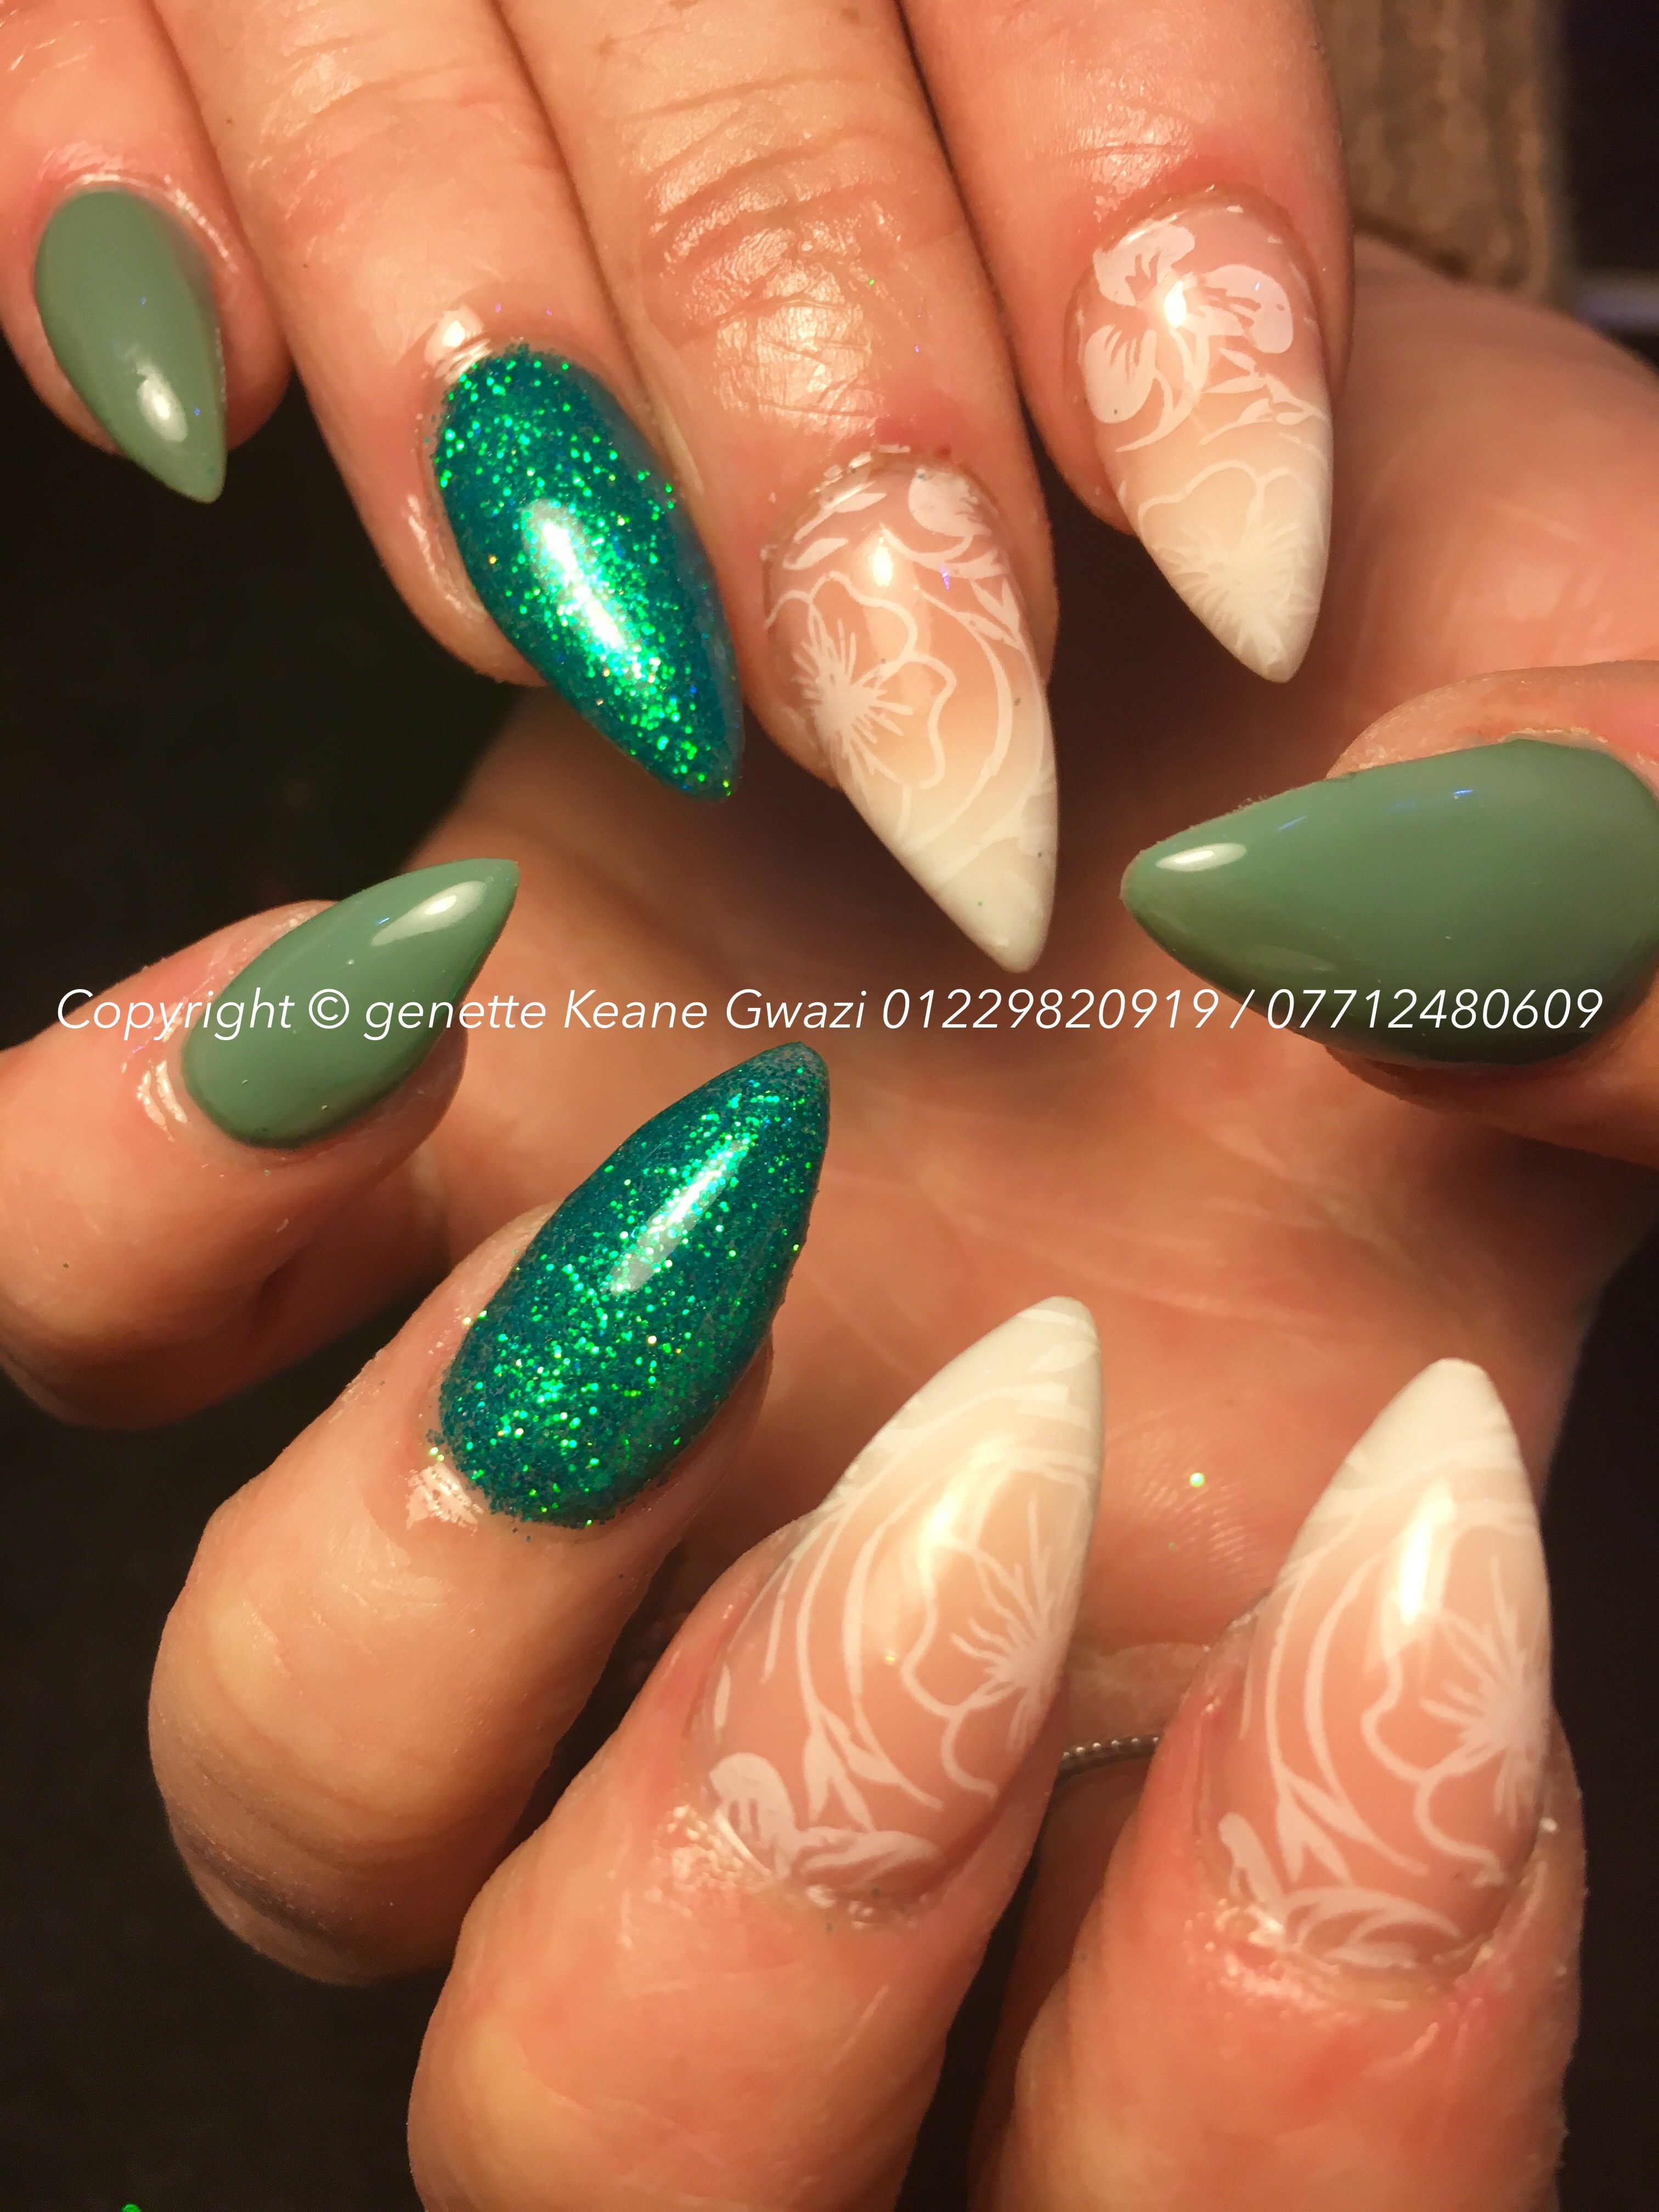 Acrylic nail salons near me - Mermaid Green Acrylic Nails Holographic Glitter Ombre Nail Art Gel Polish